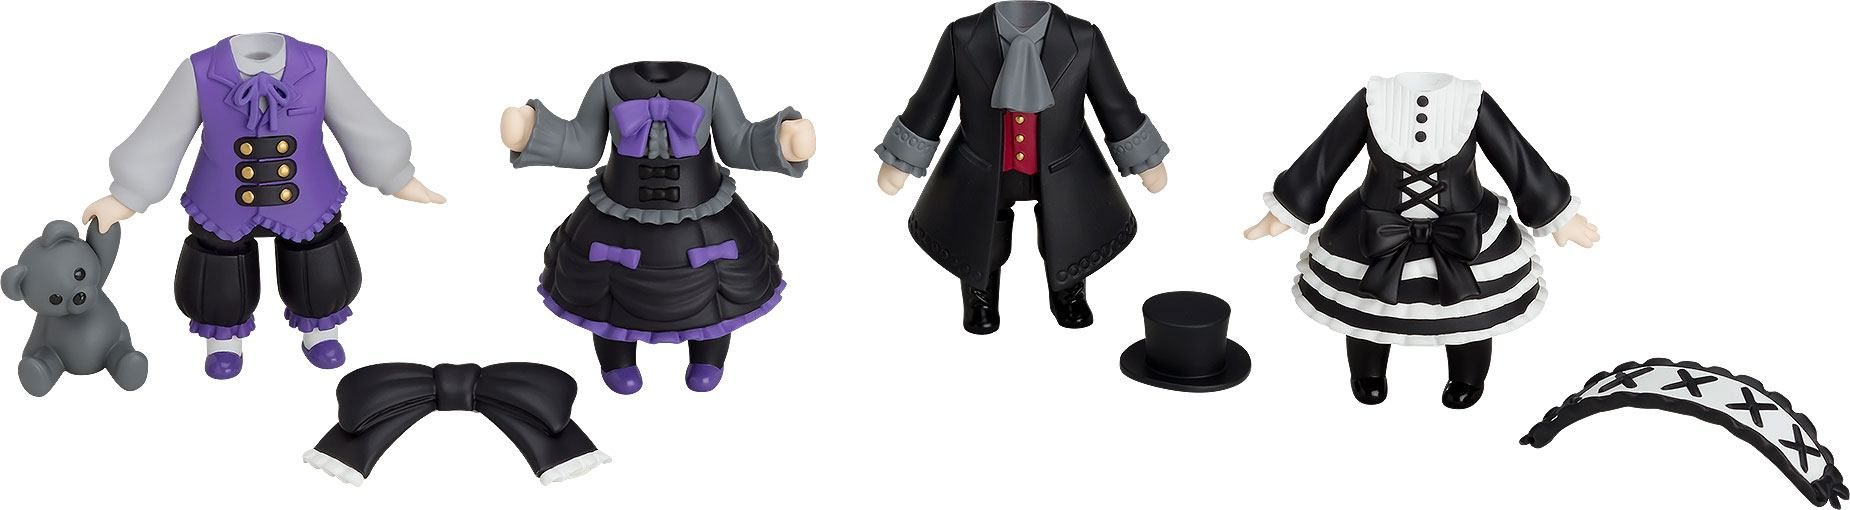 Nendoroid More 4-pack Decorative Parts for Nendoroid Figures Dress-Up Gothic Lolita